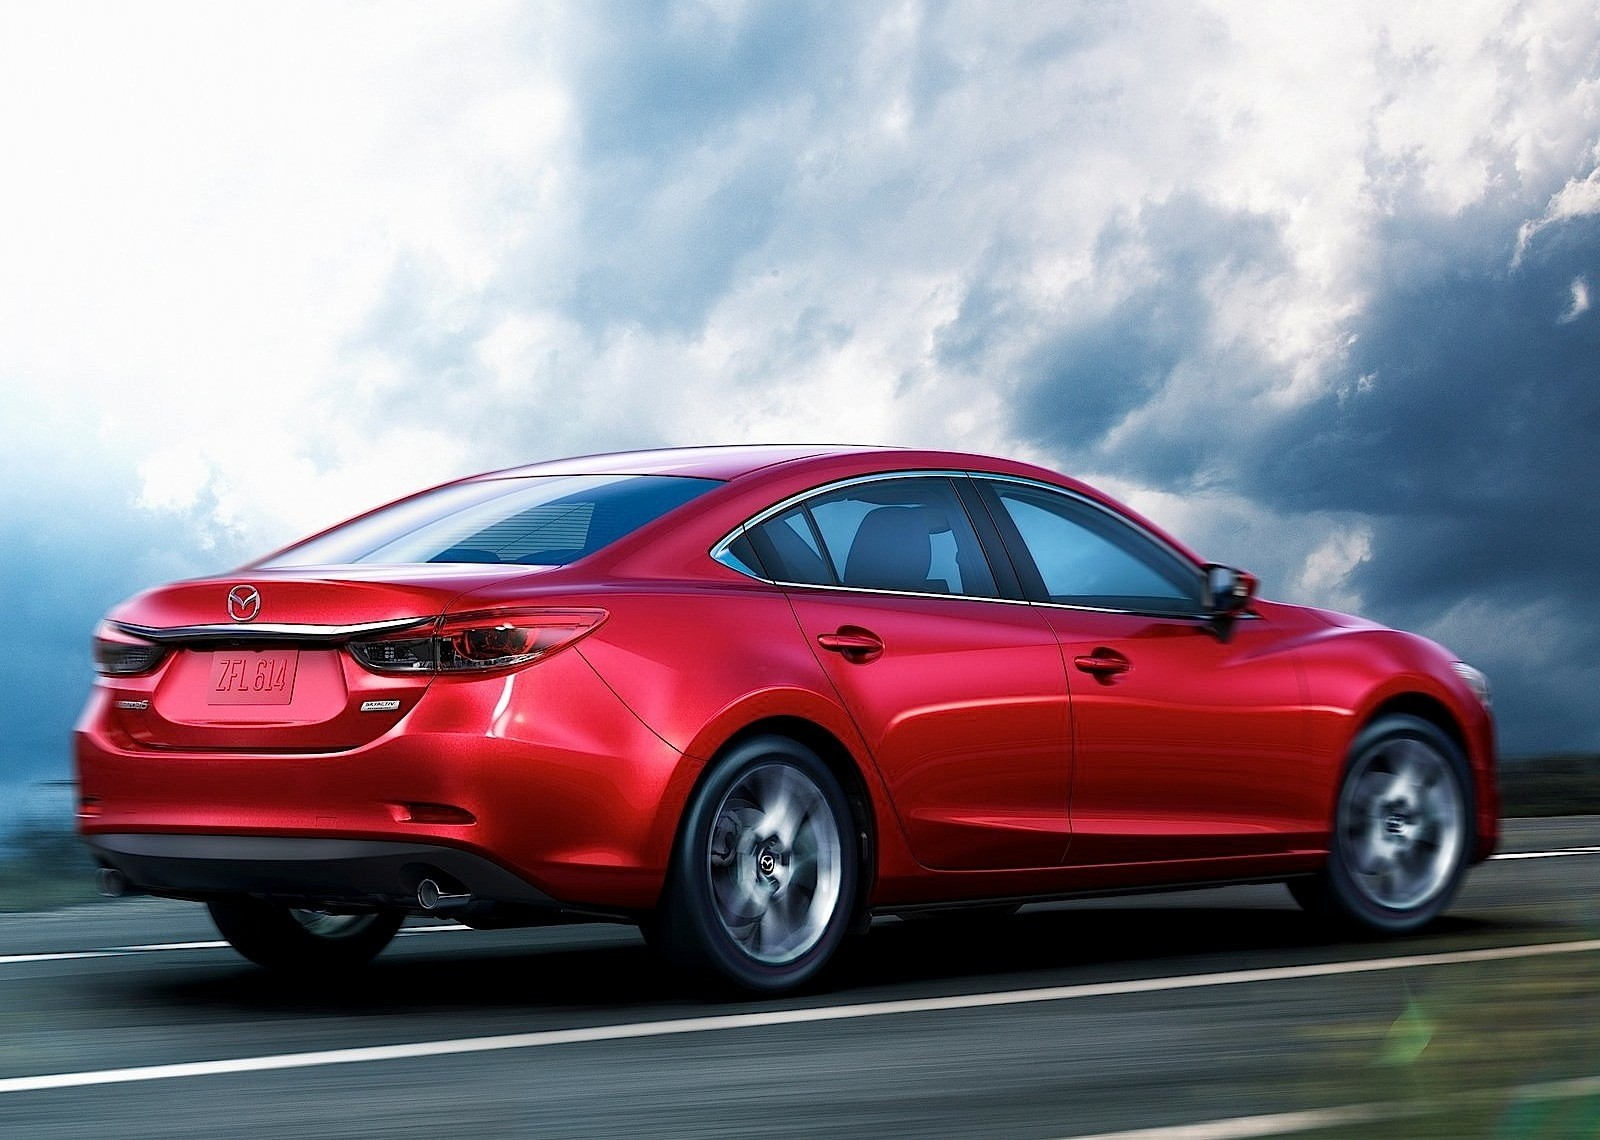 Mazda 6 Ajovalopolttimon Vaihto